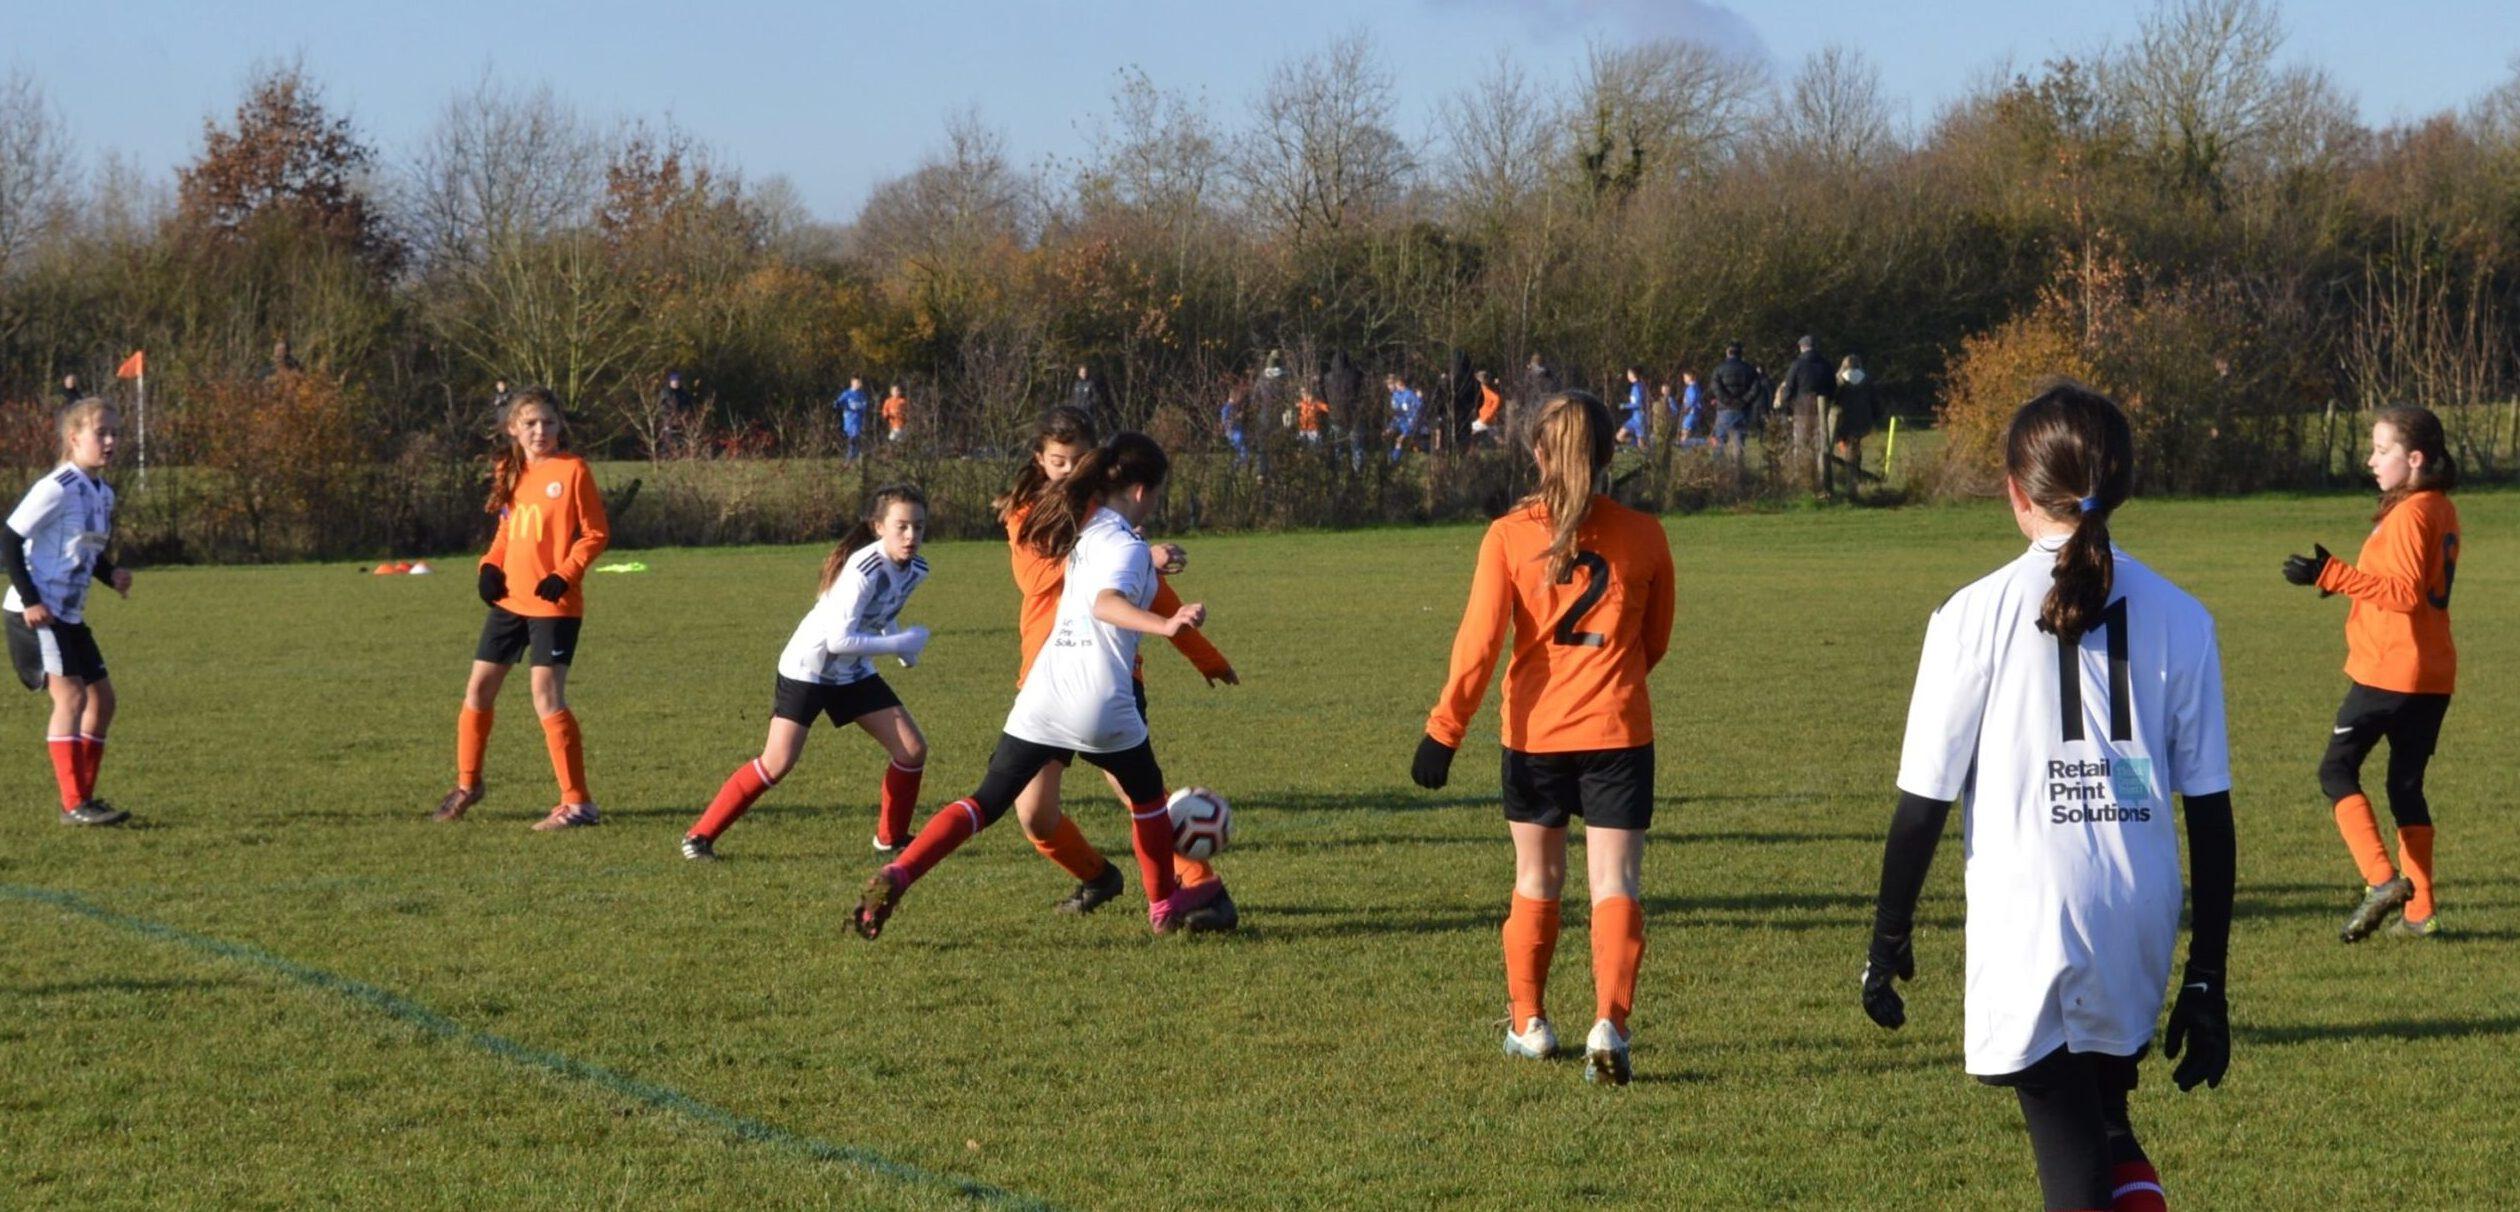 Rugby Borough Girls U12s v Cosby United Youth Girls U12s - Match Photo